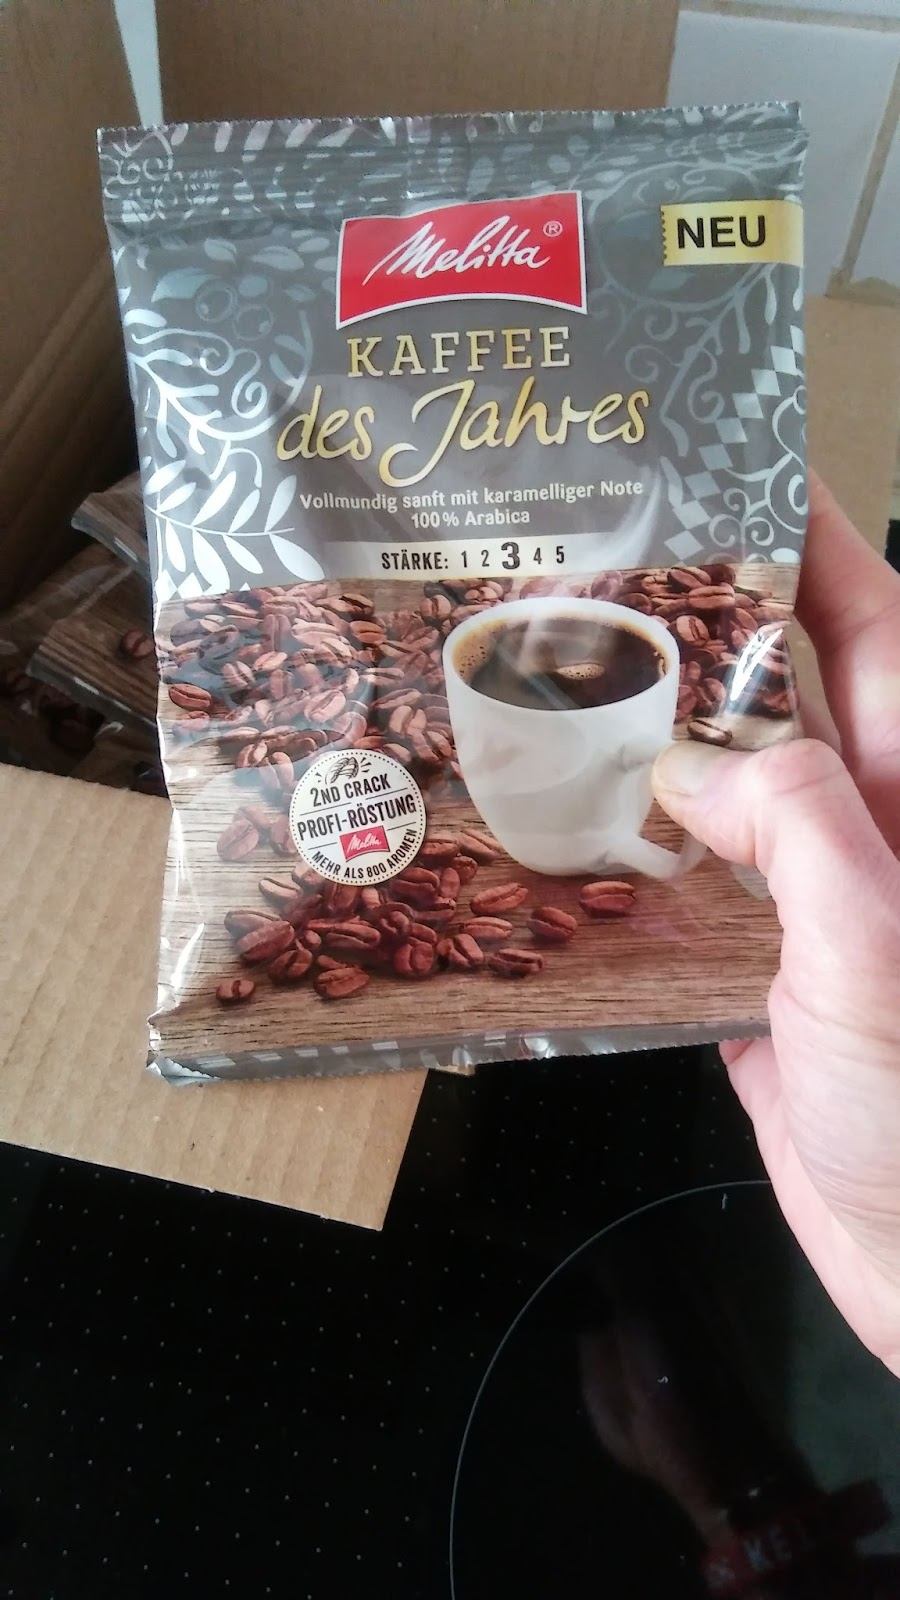 engel 2016 testet gern f r euch getestet melitta kaffee des jahres 2018 als filterkaffee. Black Bedroom Furniture Sets. Home Design Ideas